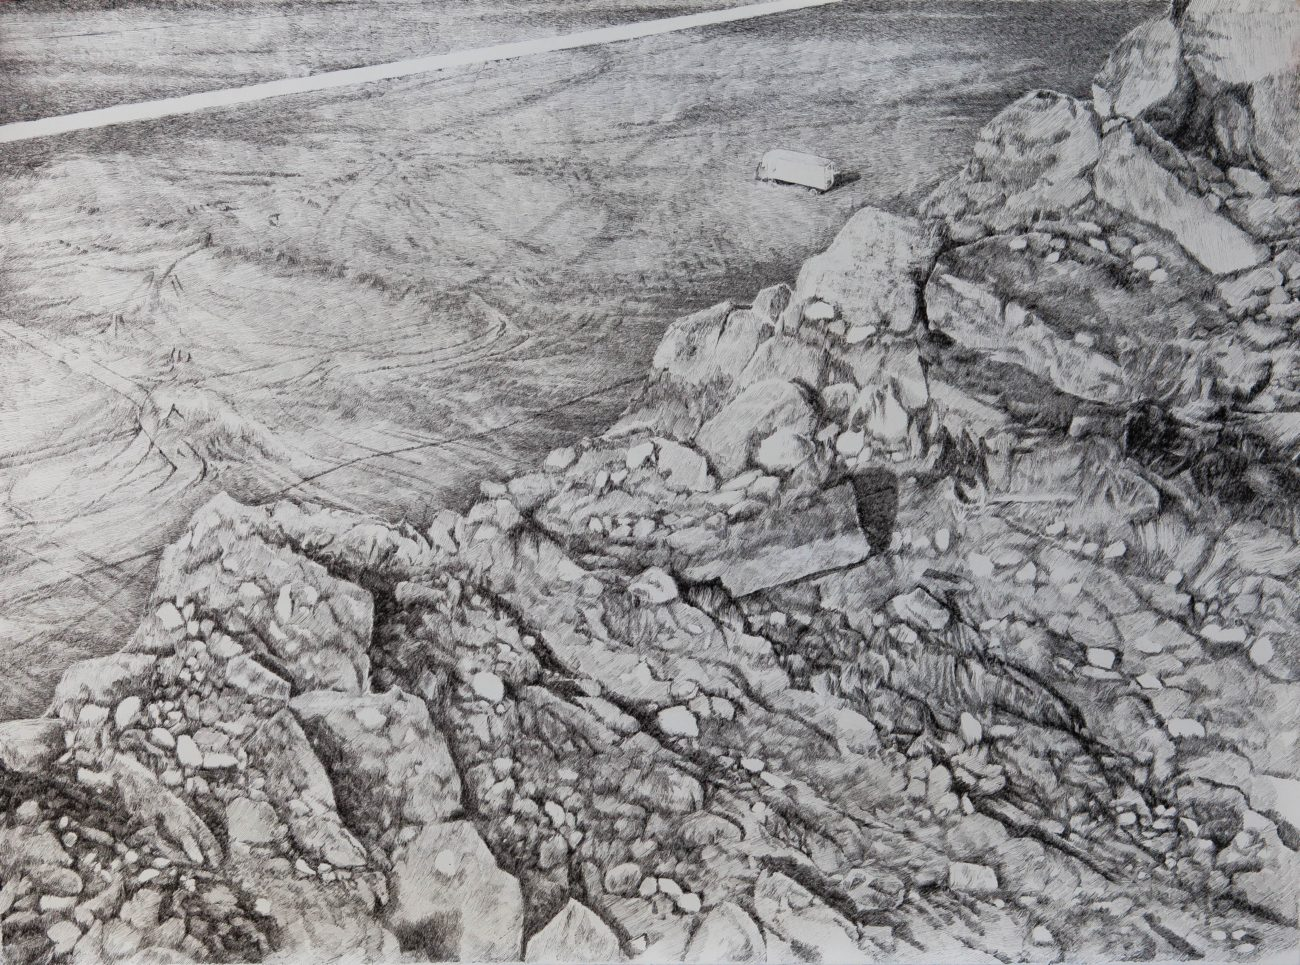 emmanuel henninger, kunst, landschaften, tagebau, köhle, zeichnung